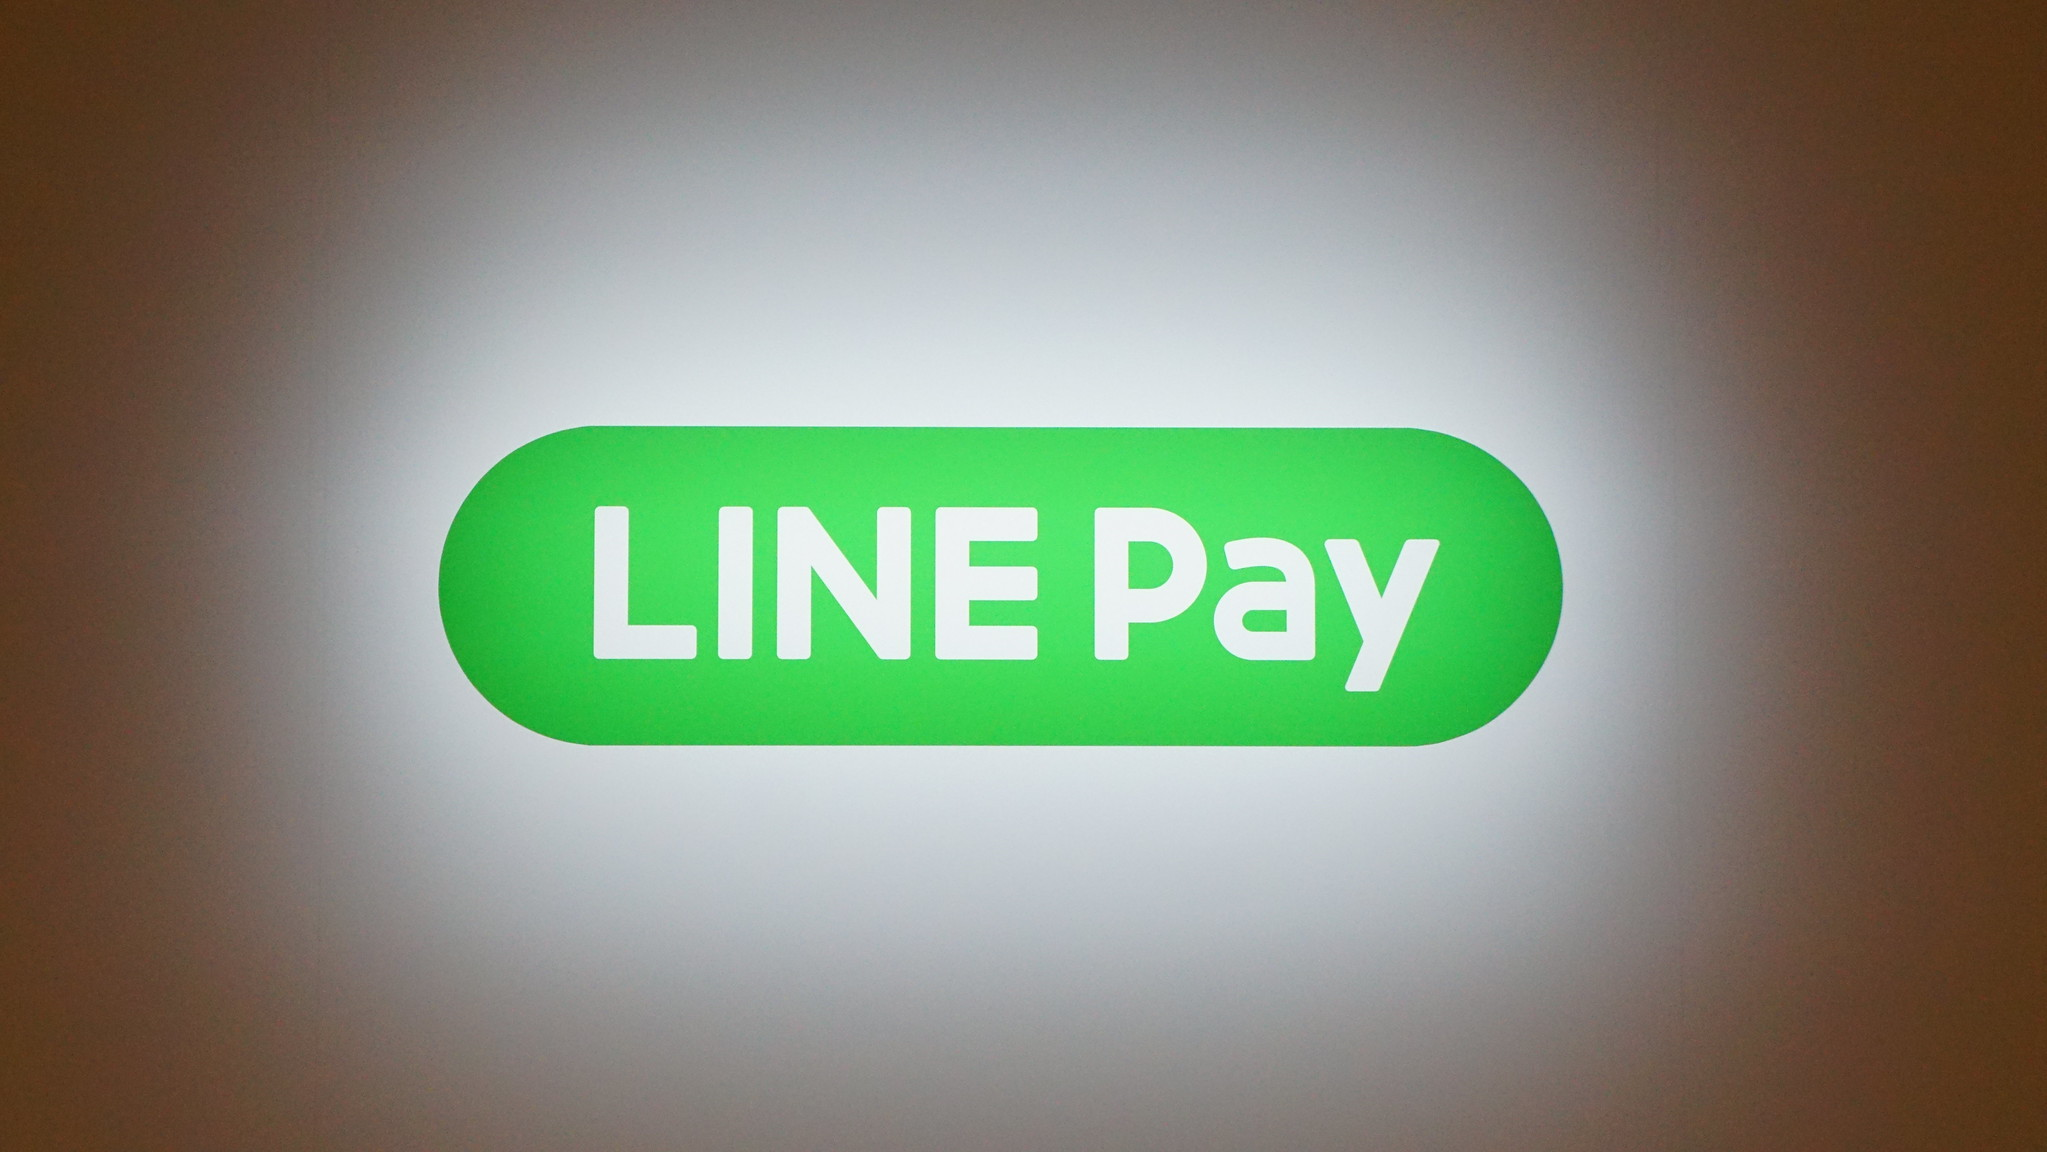 LINE Pay、5月から還元率を一律0.5%に改悪。LINEクレカは3%→2%